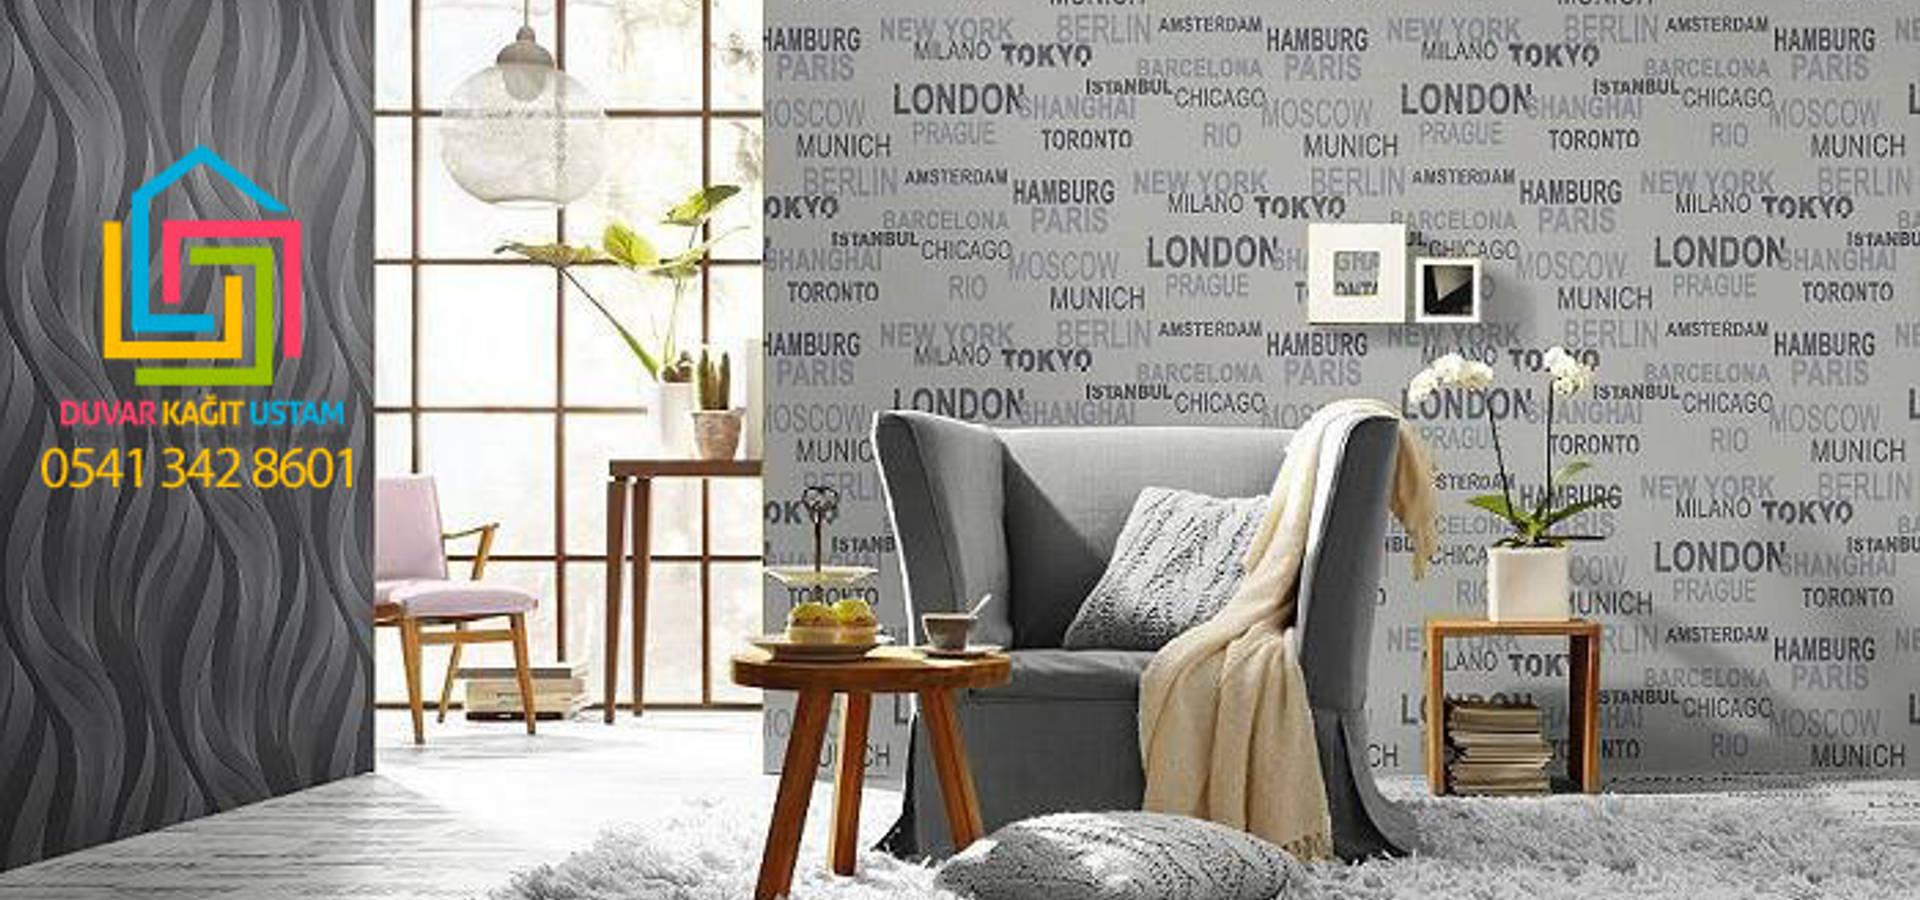 Duvar Kağıt Ustam